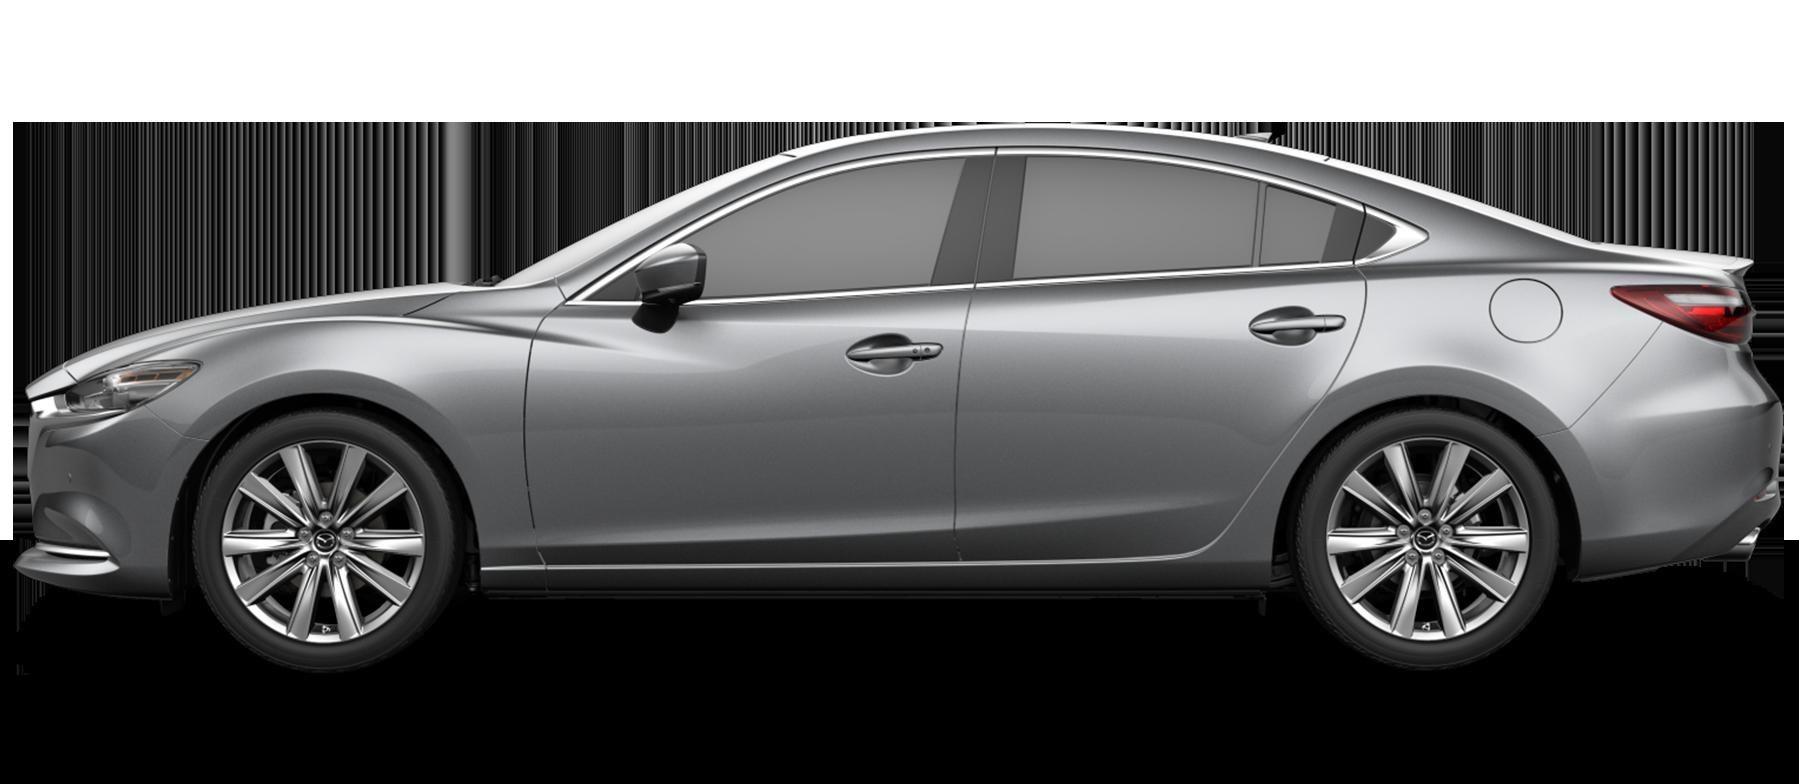 Imagen del Mazda62018